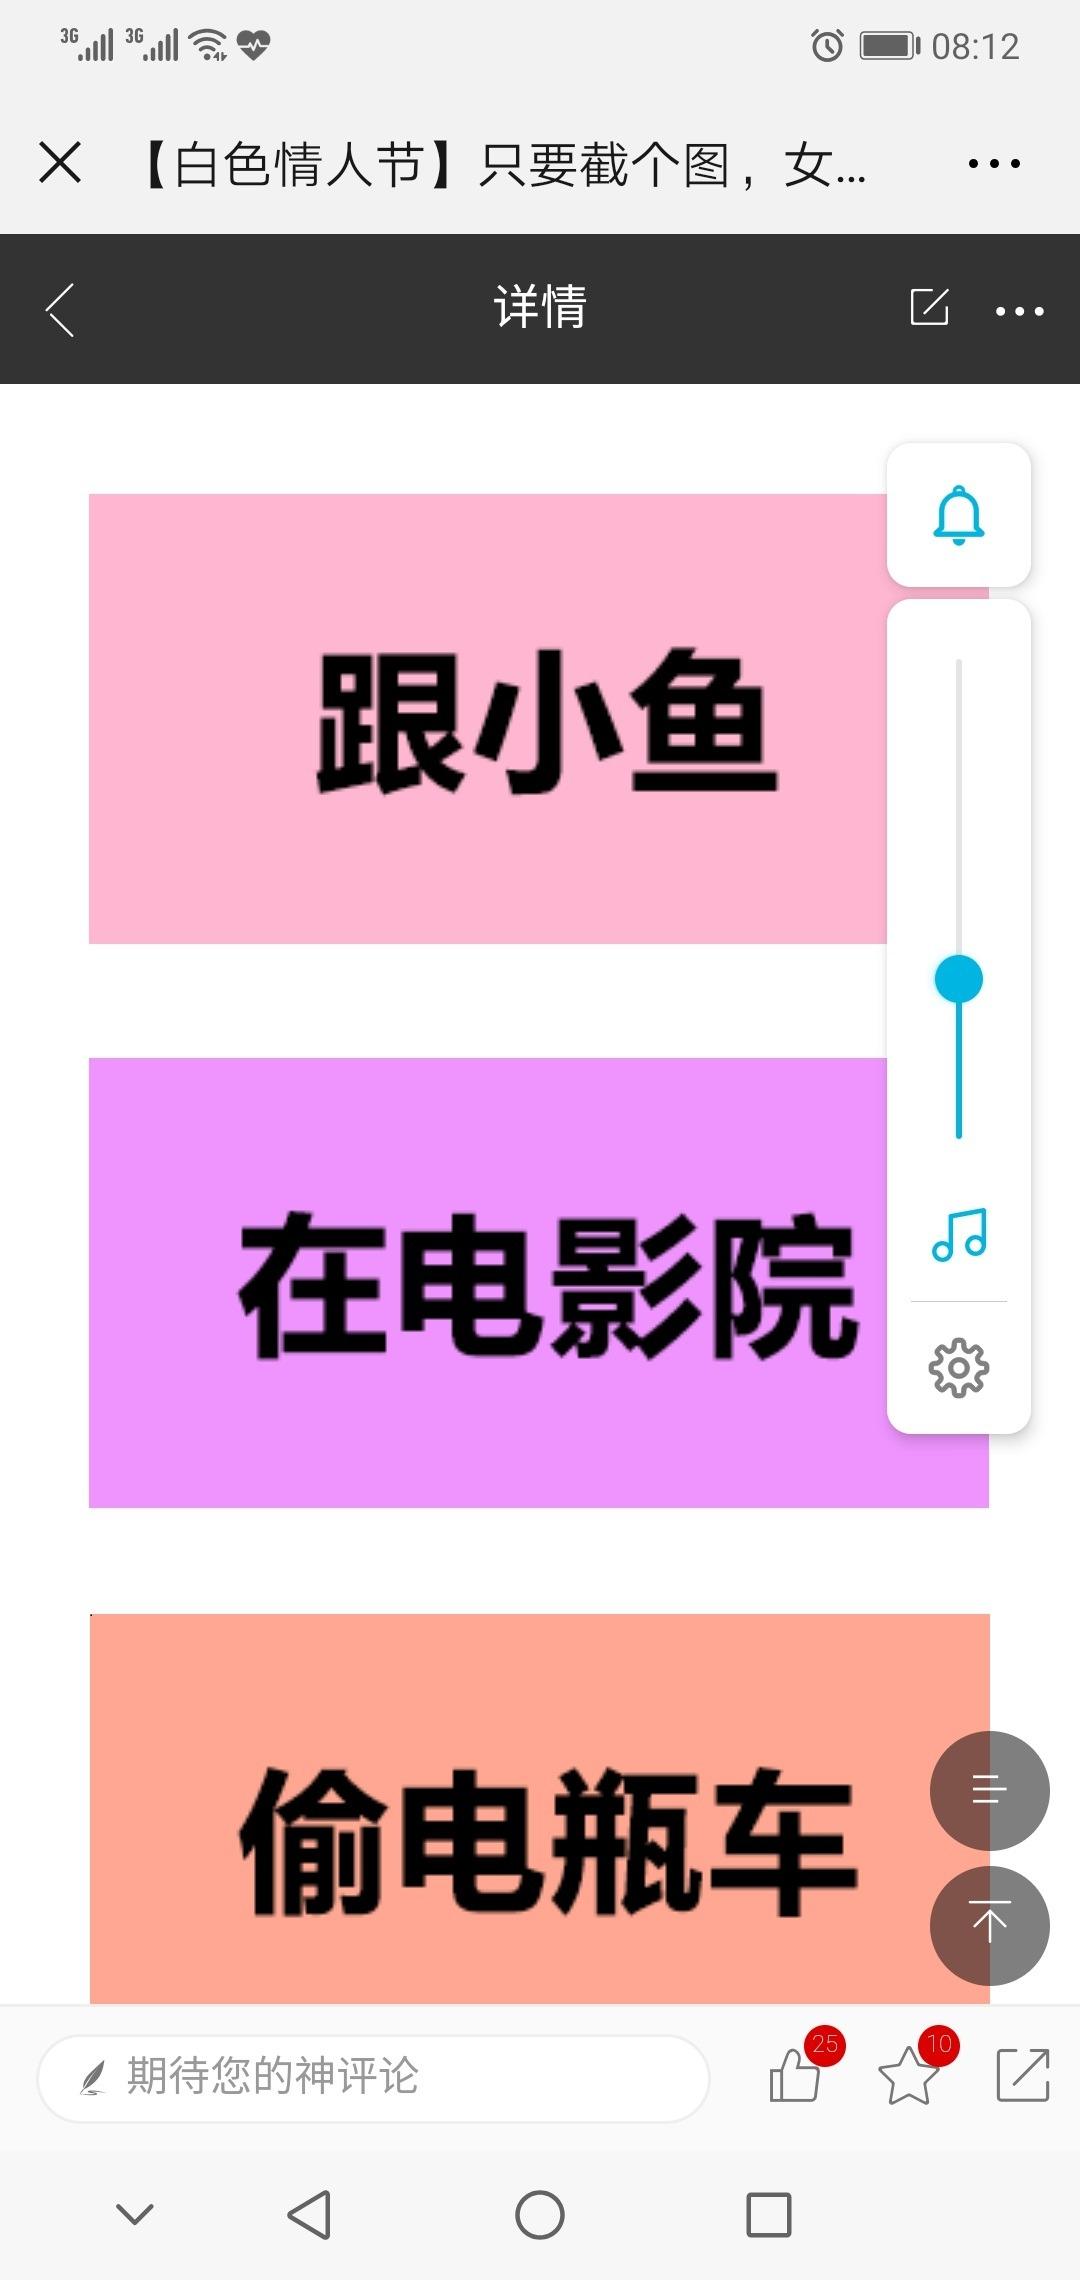 Screenshot_20190314_081228_com tencent mm.jpg